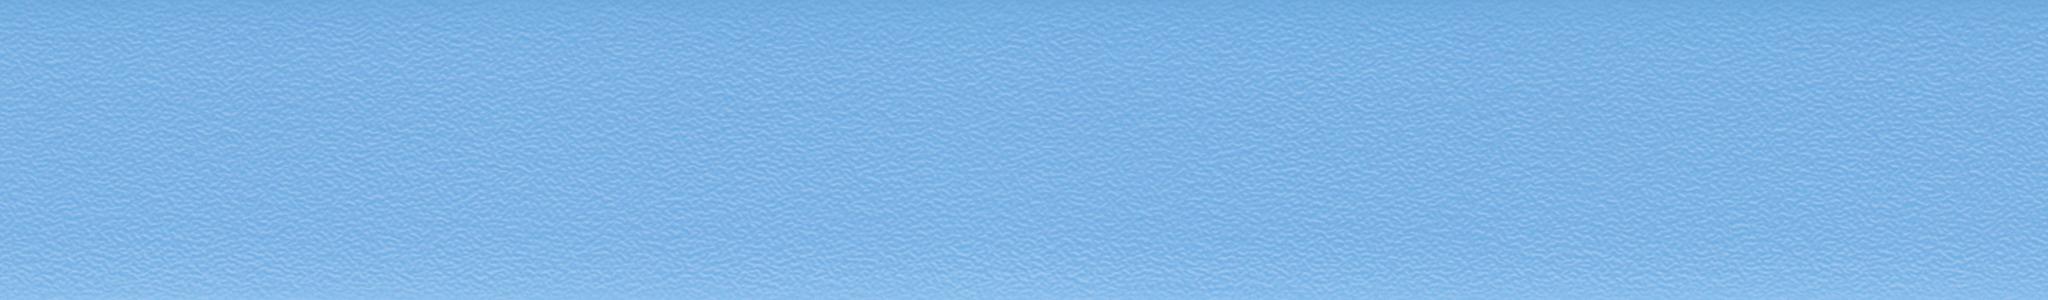 HU 15523 ABS Kante UNI Blau perl 101